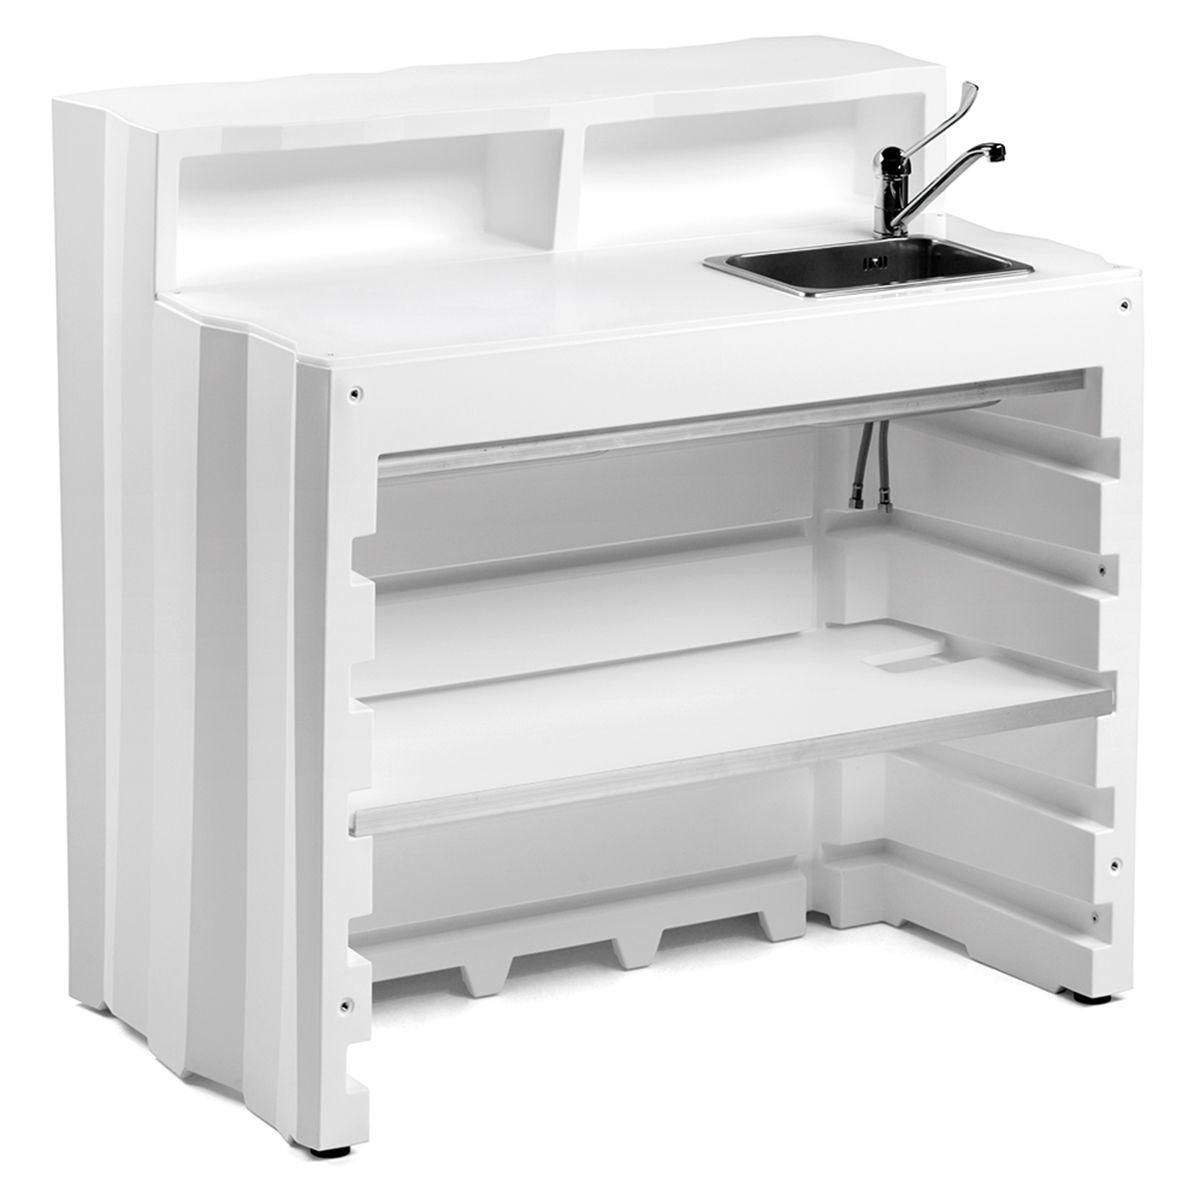 Bancone Bar Da Giardino bancone bar modulare da esterno modello frozen | arredo bar